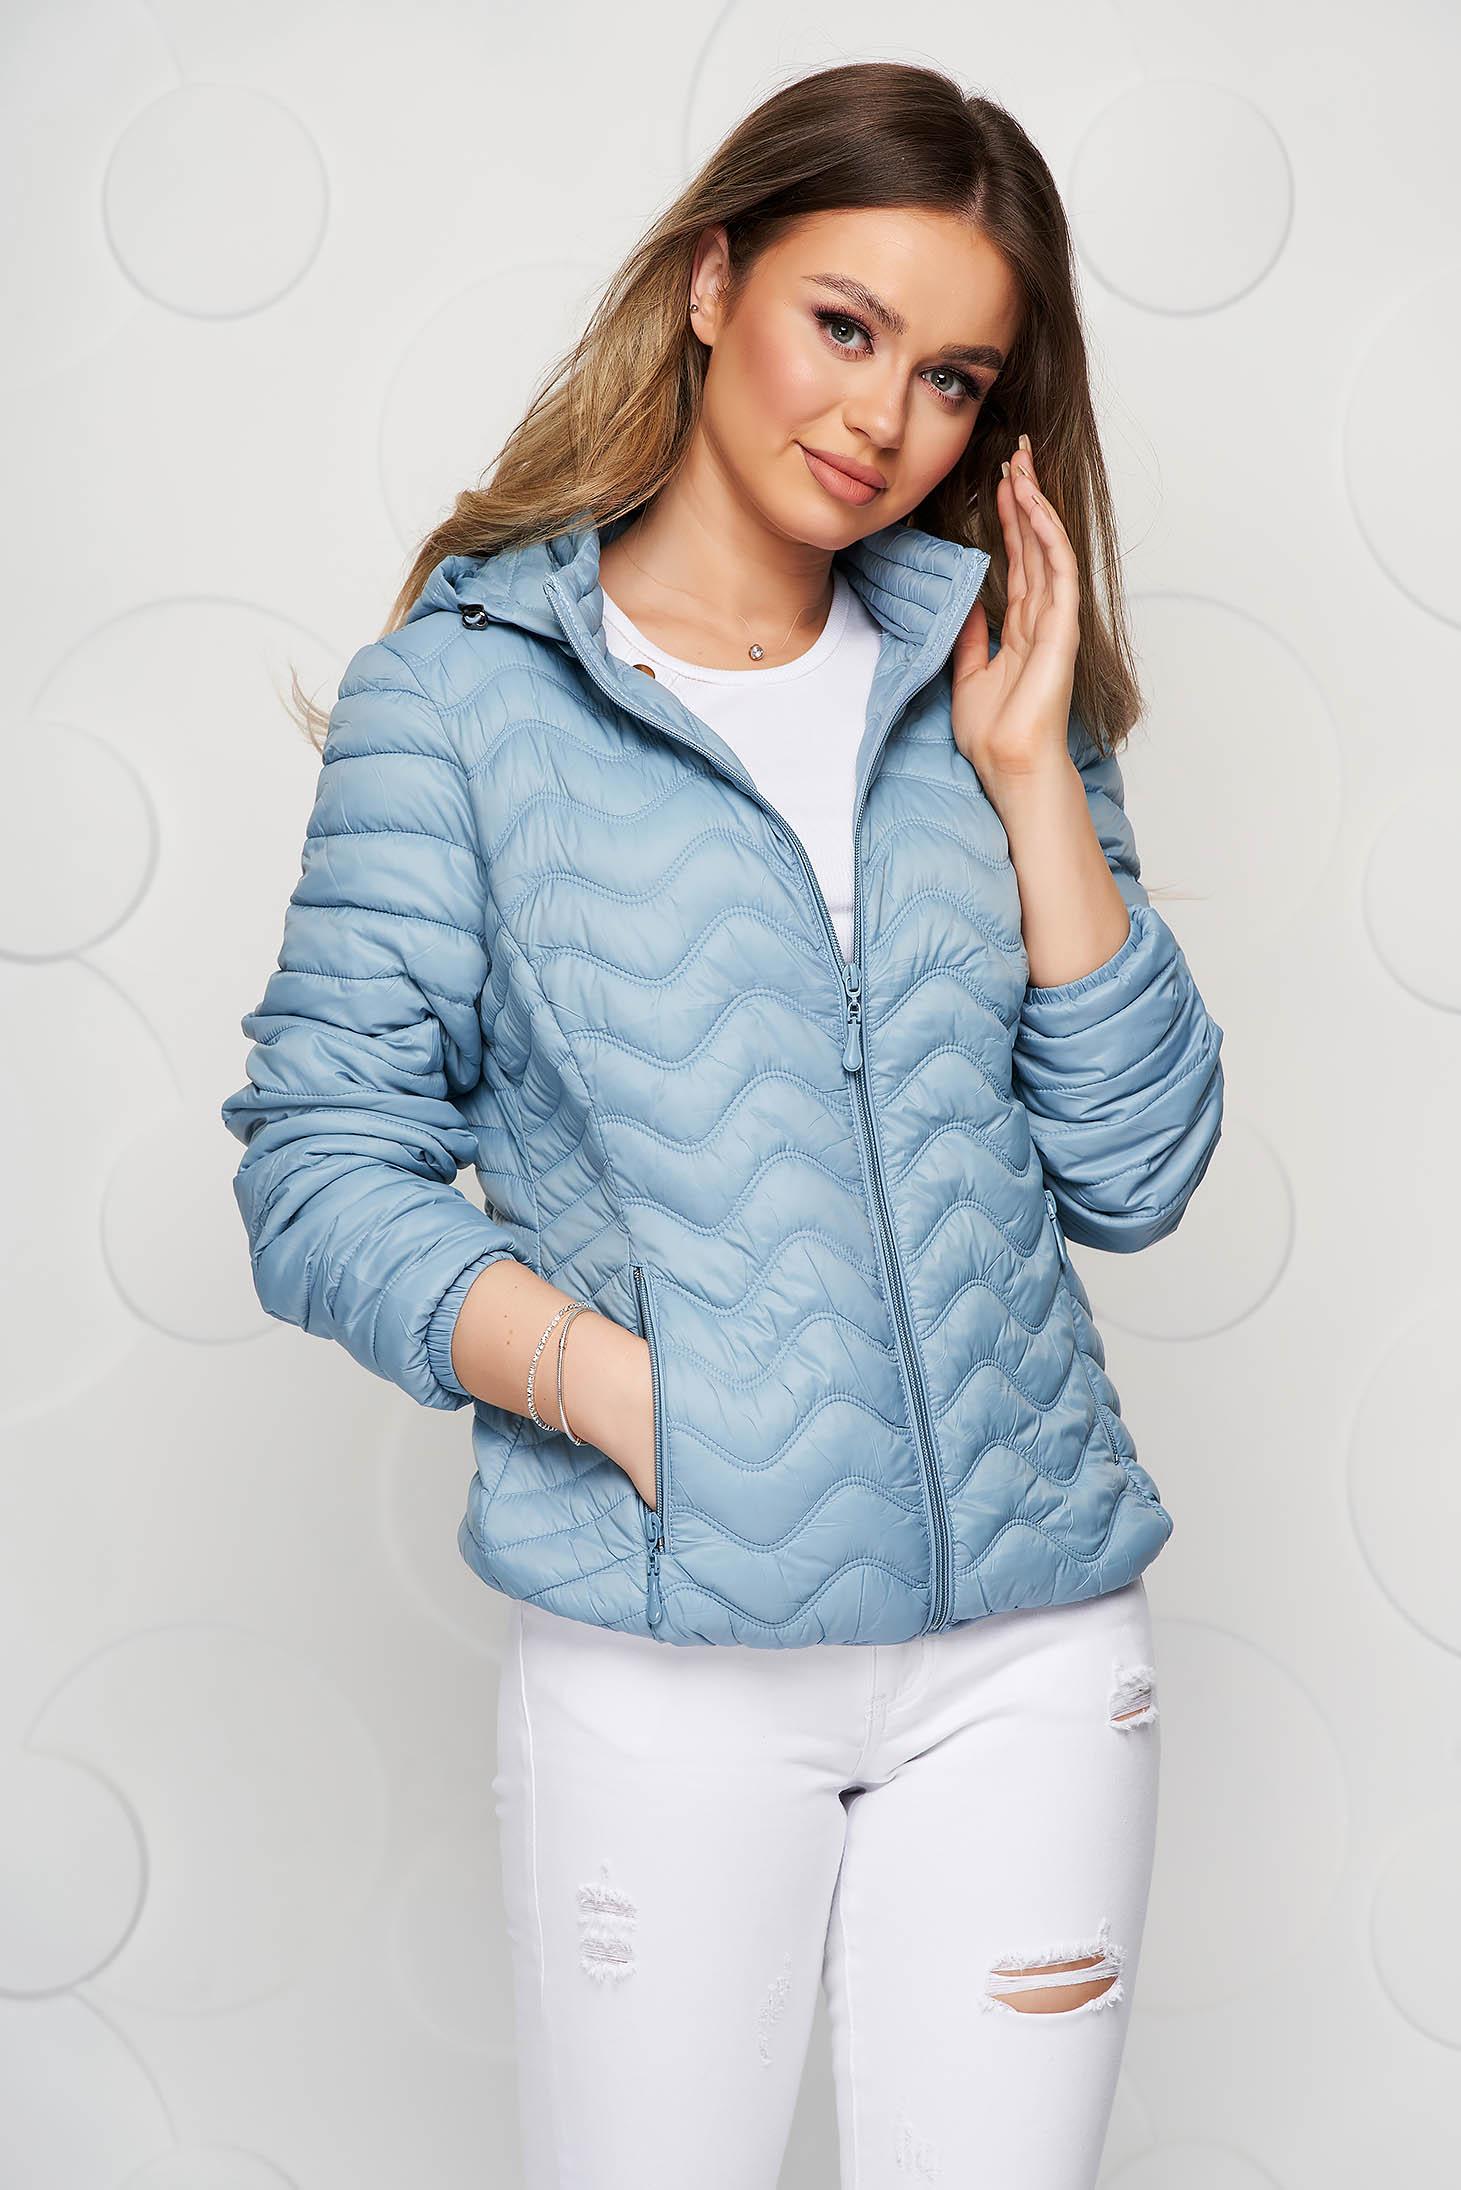 Lightblue jacket tented from slicker sporty